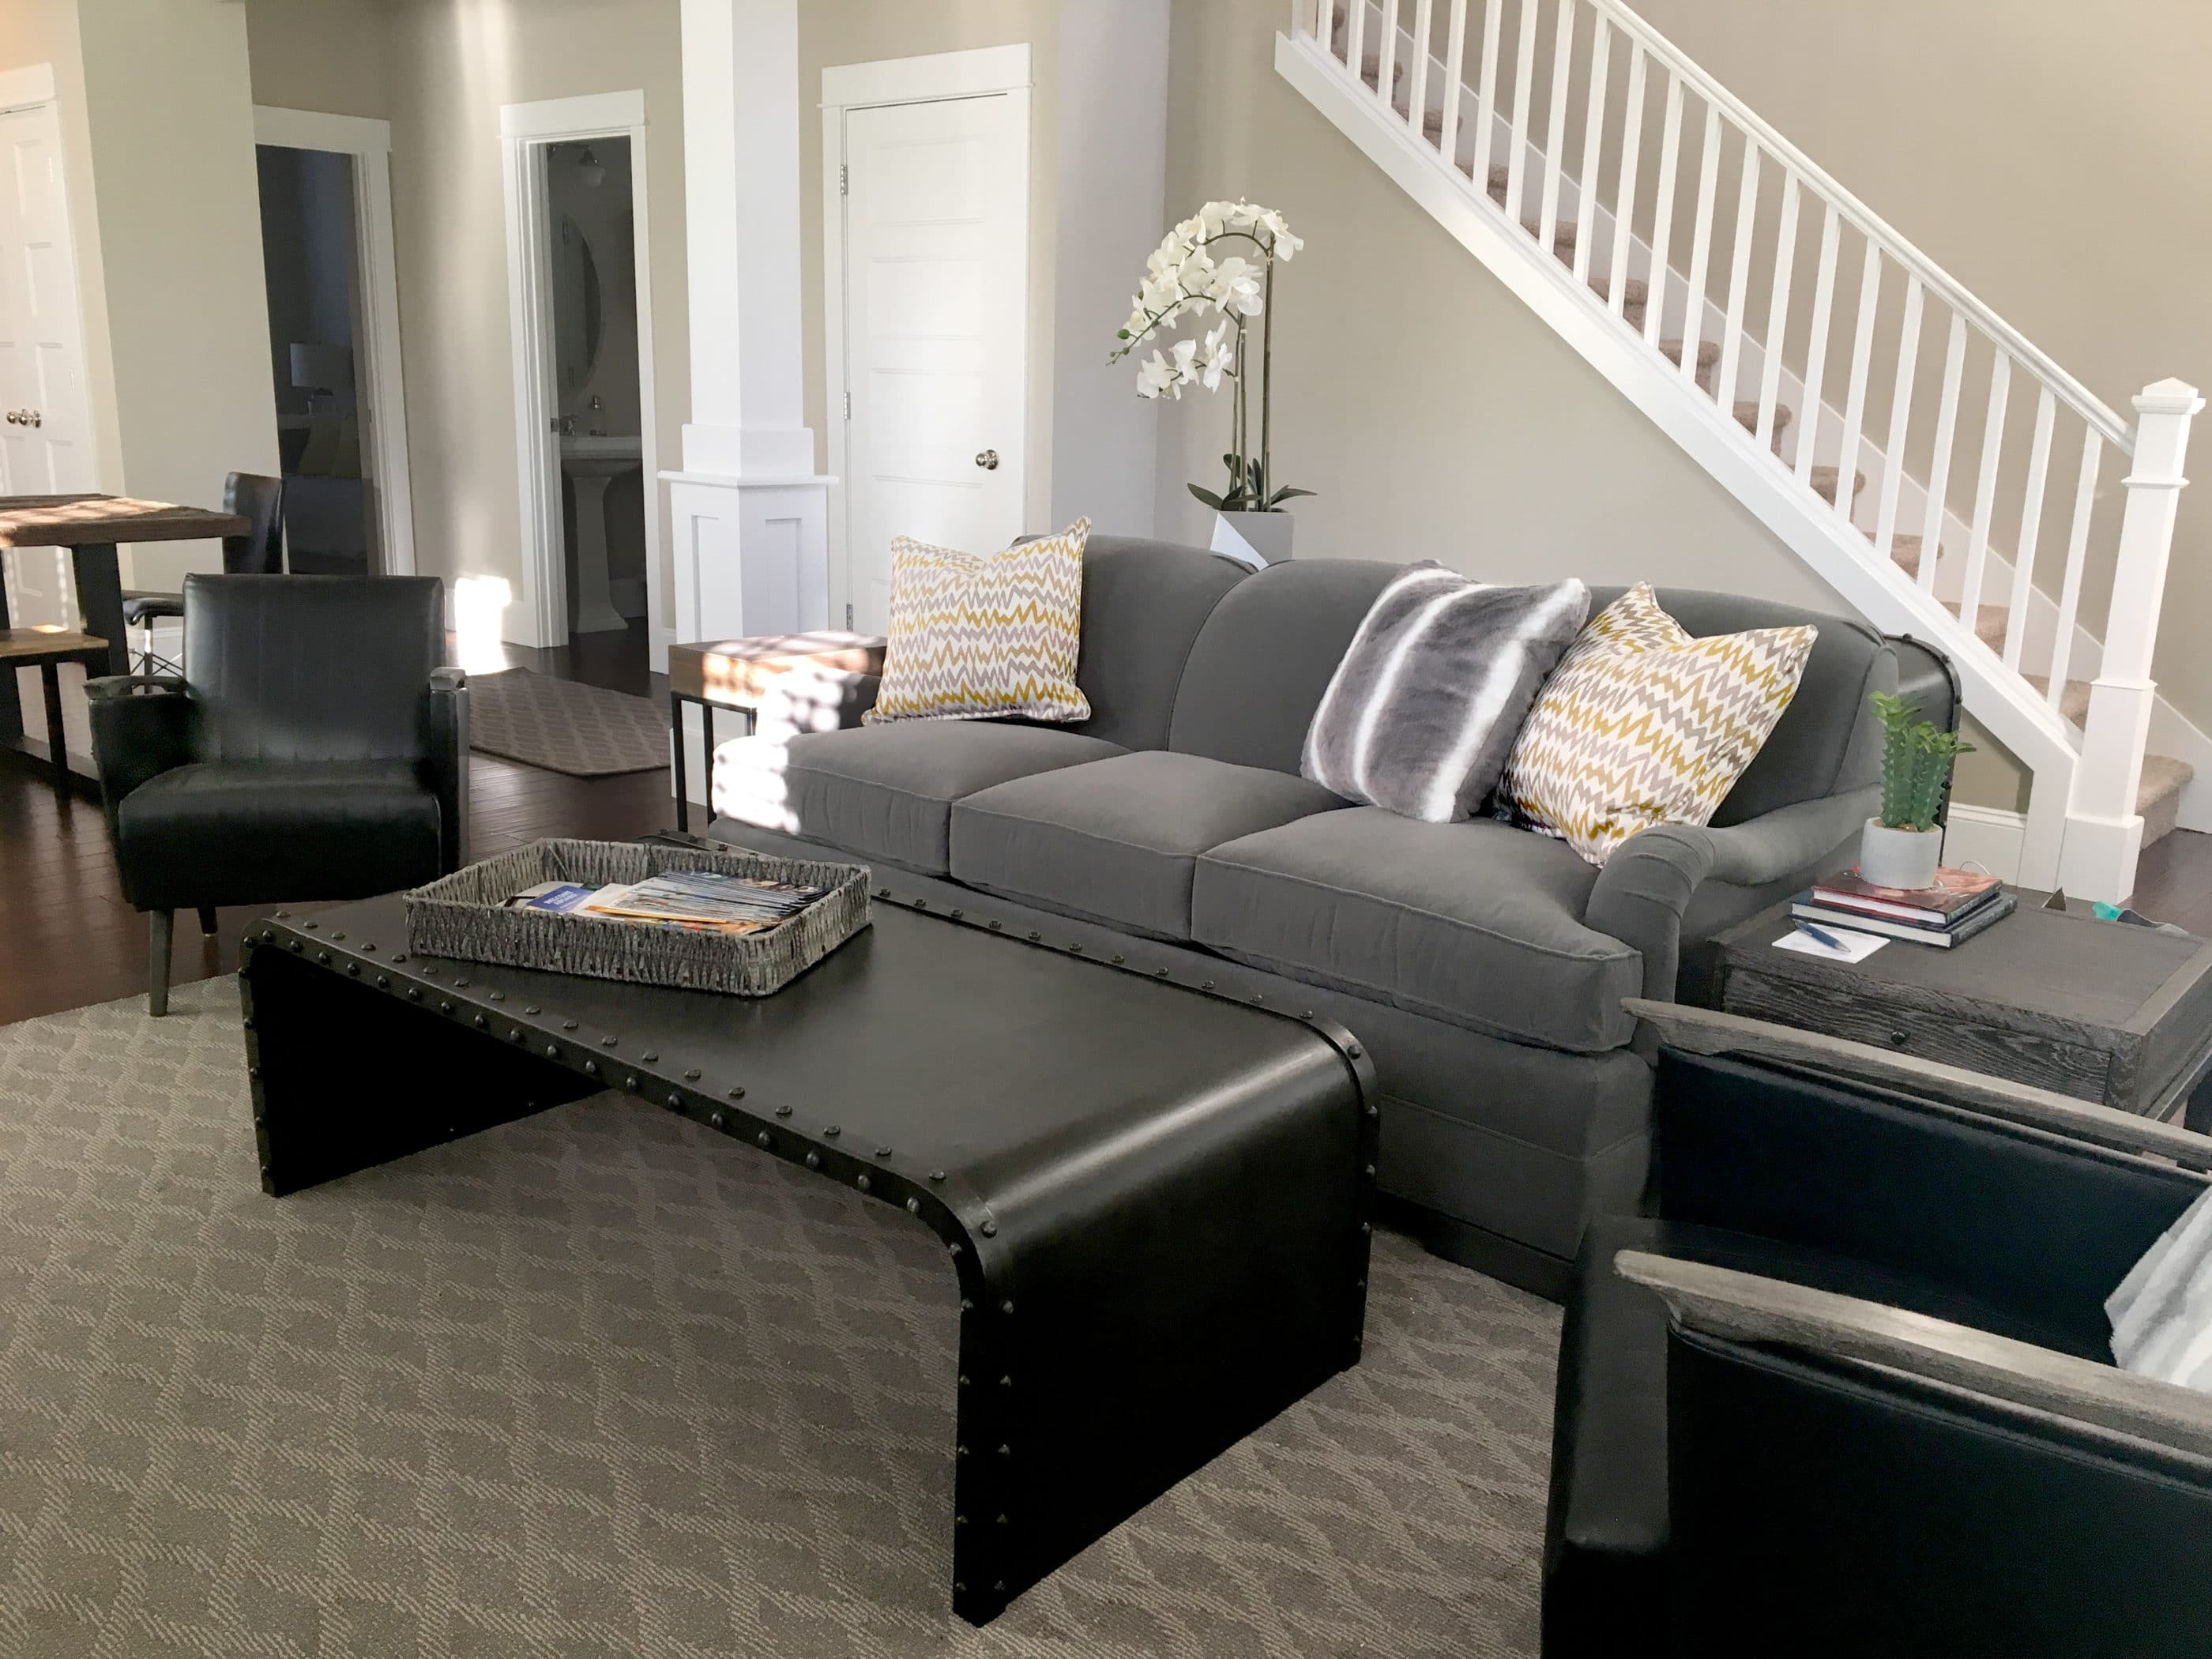 vacation rental interior decor with gray sofa